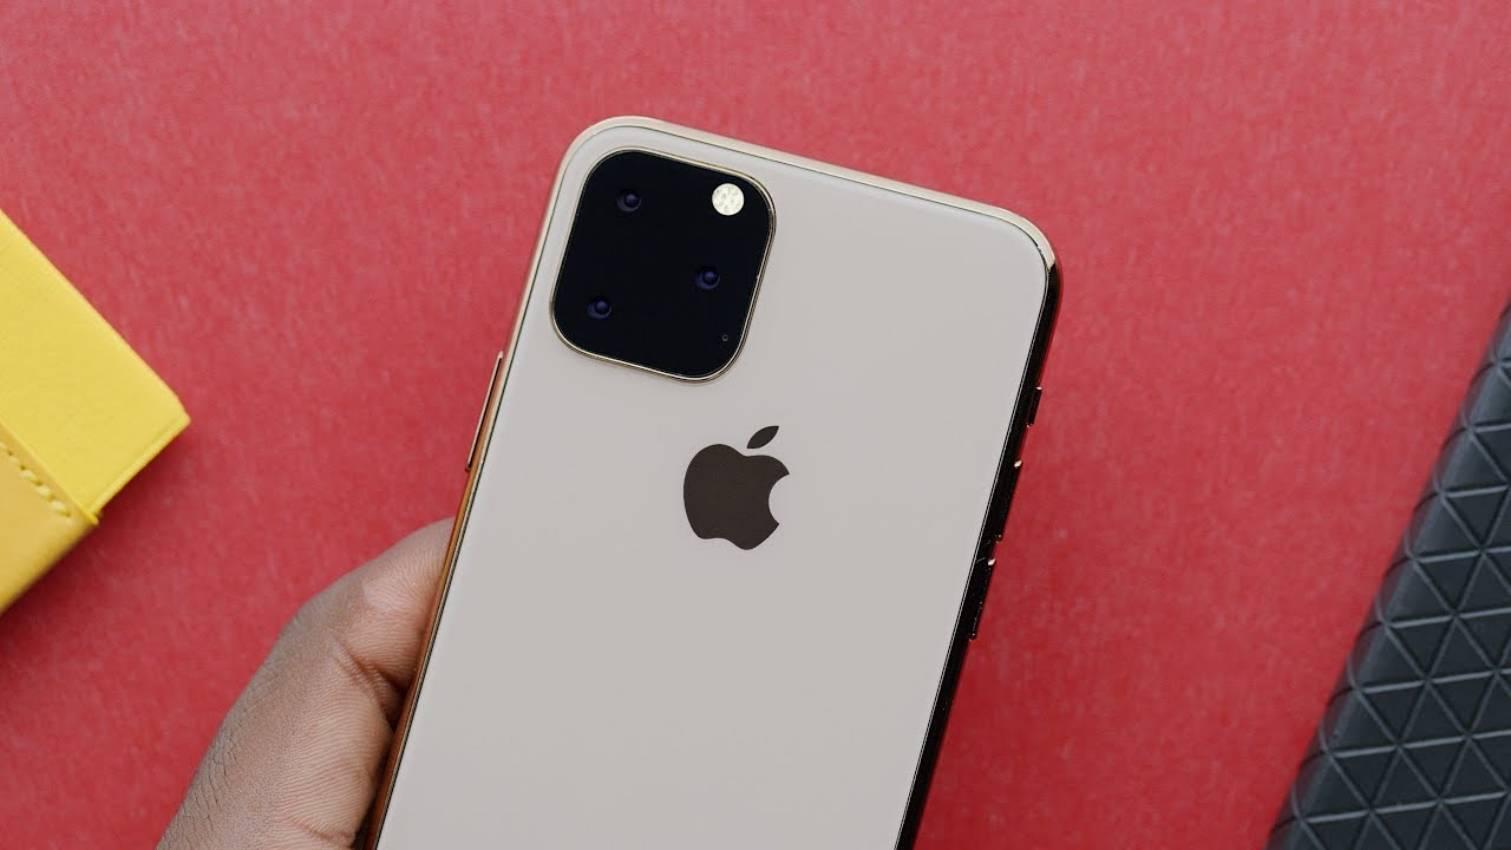 iPhone 11 va DEPASI RECORDUL Stabilit de GALAXY NOTE 10